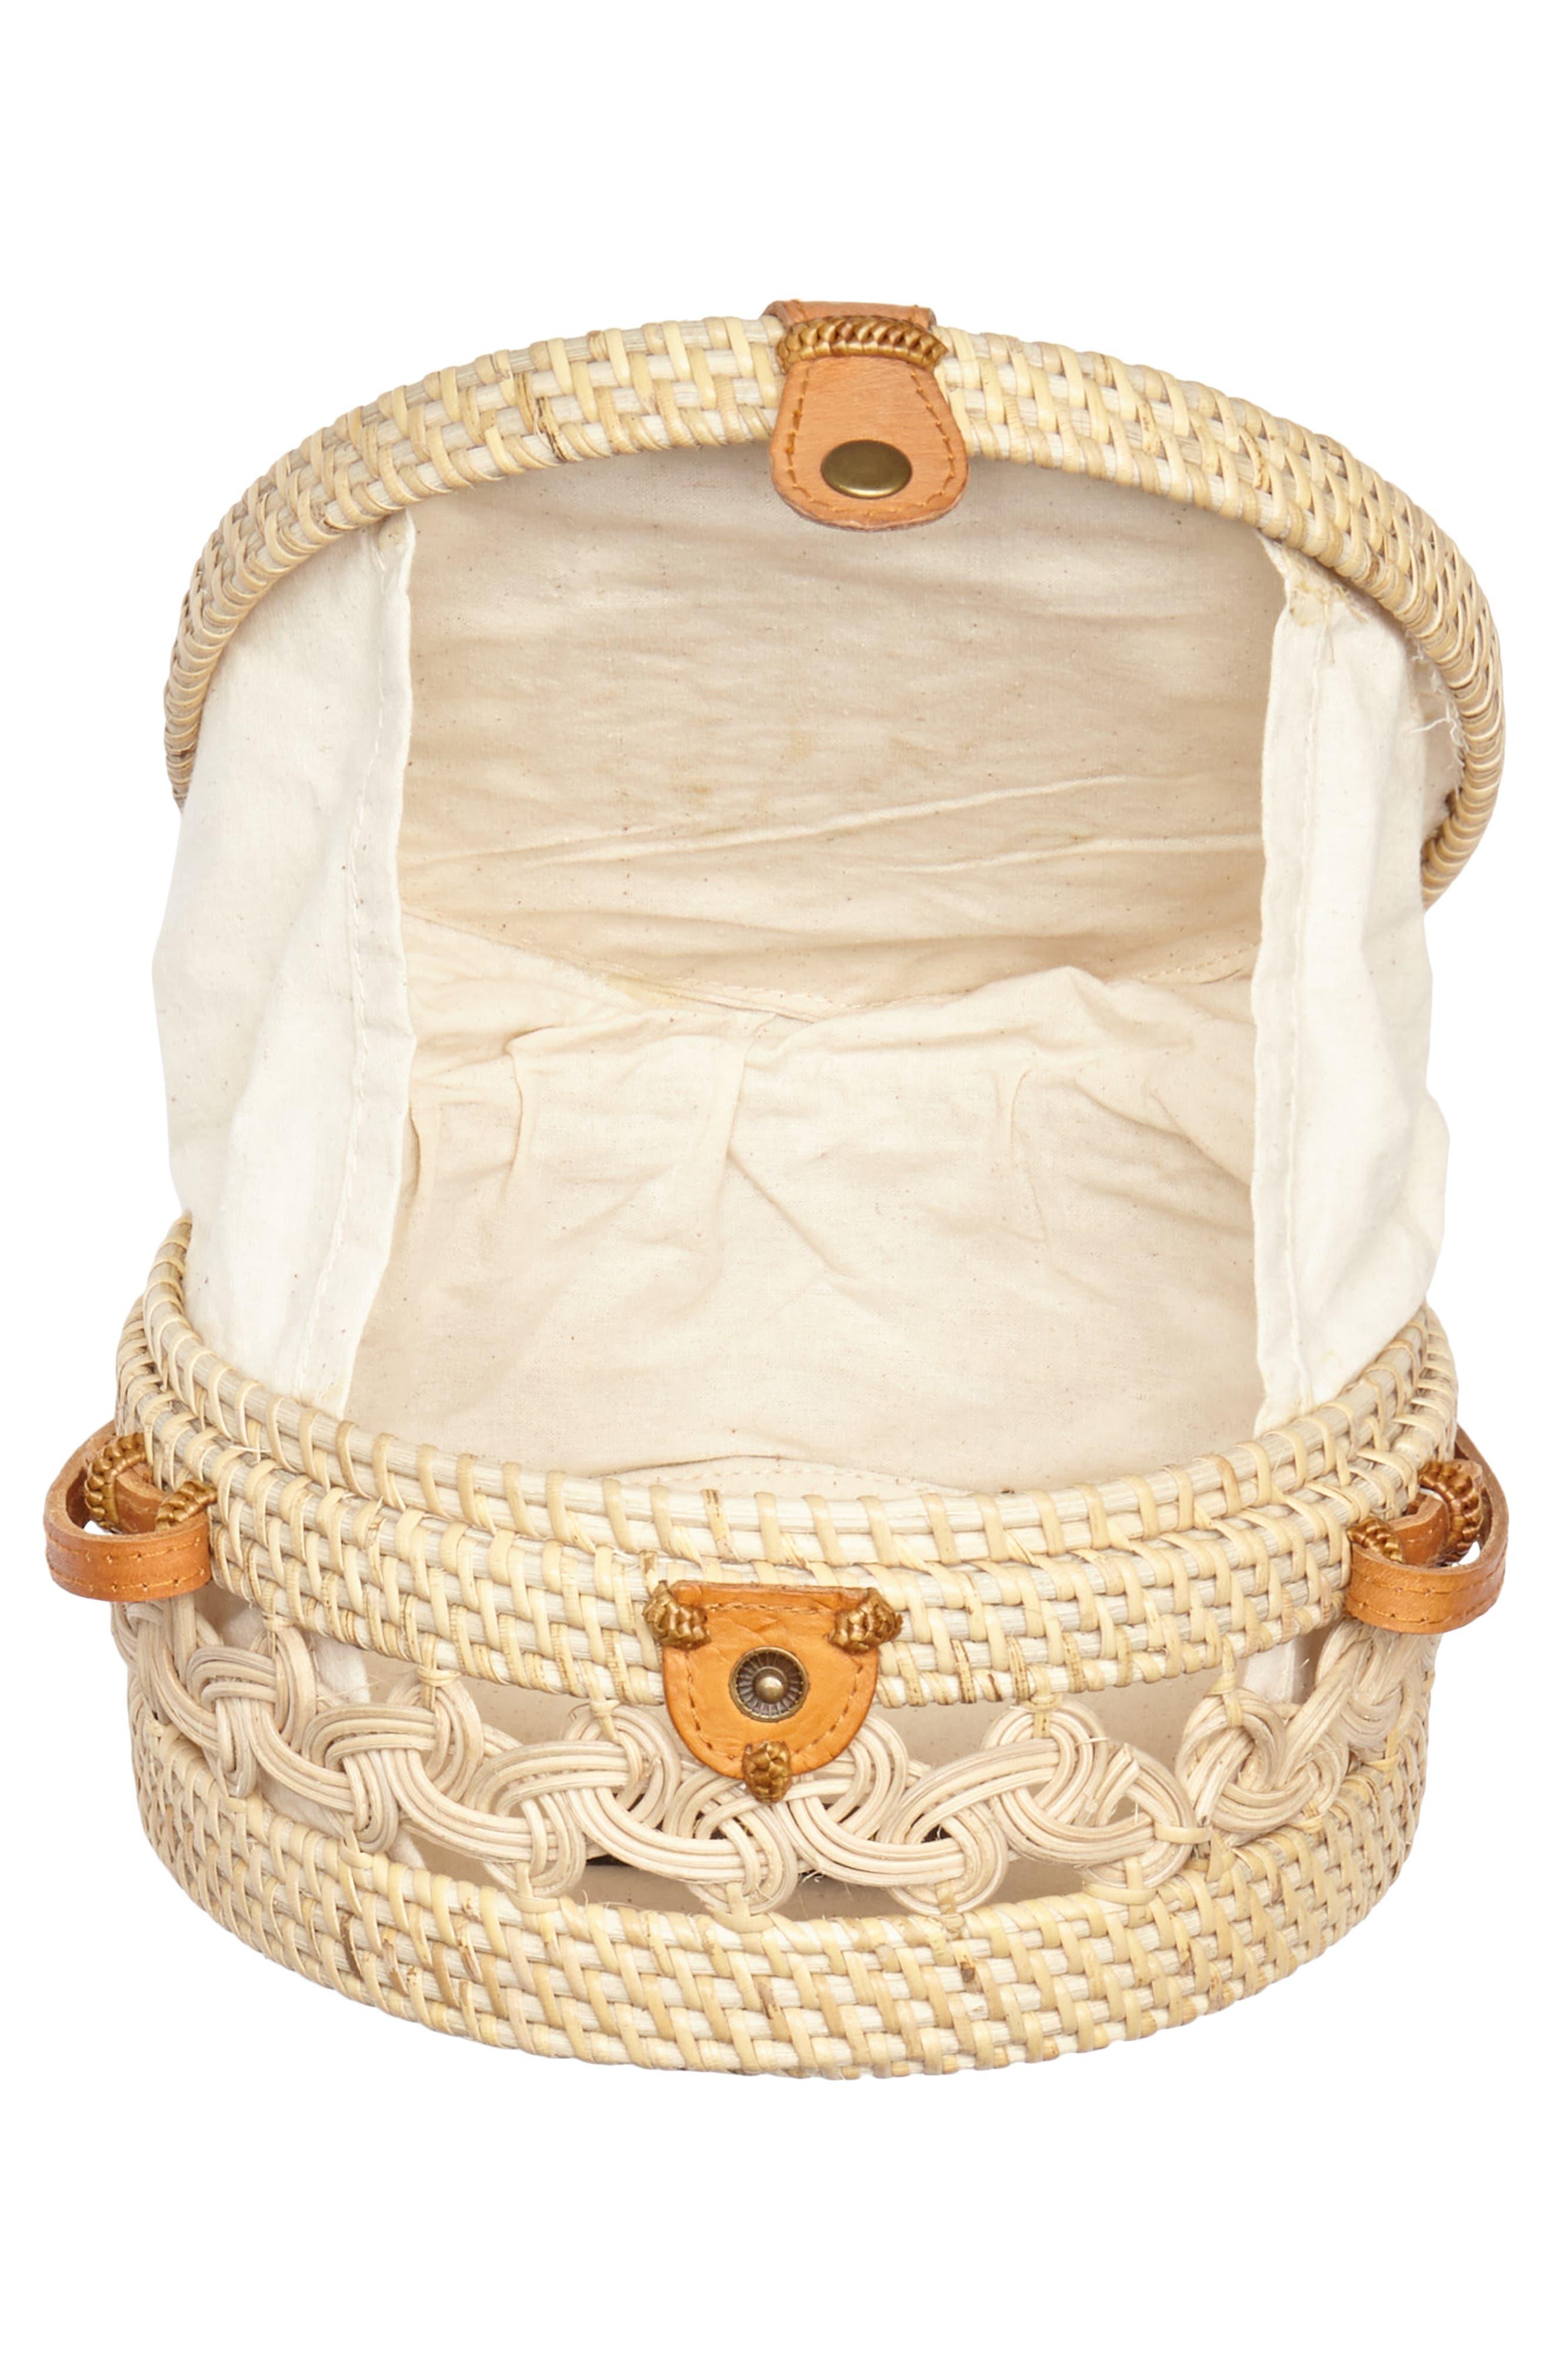 Woven Rattan Circle Crossbody Bag,                             Alternate thumbnail 4, color,                             Lighter Tan/ Natural